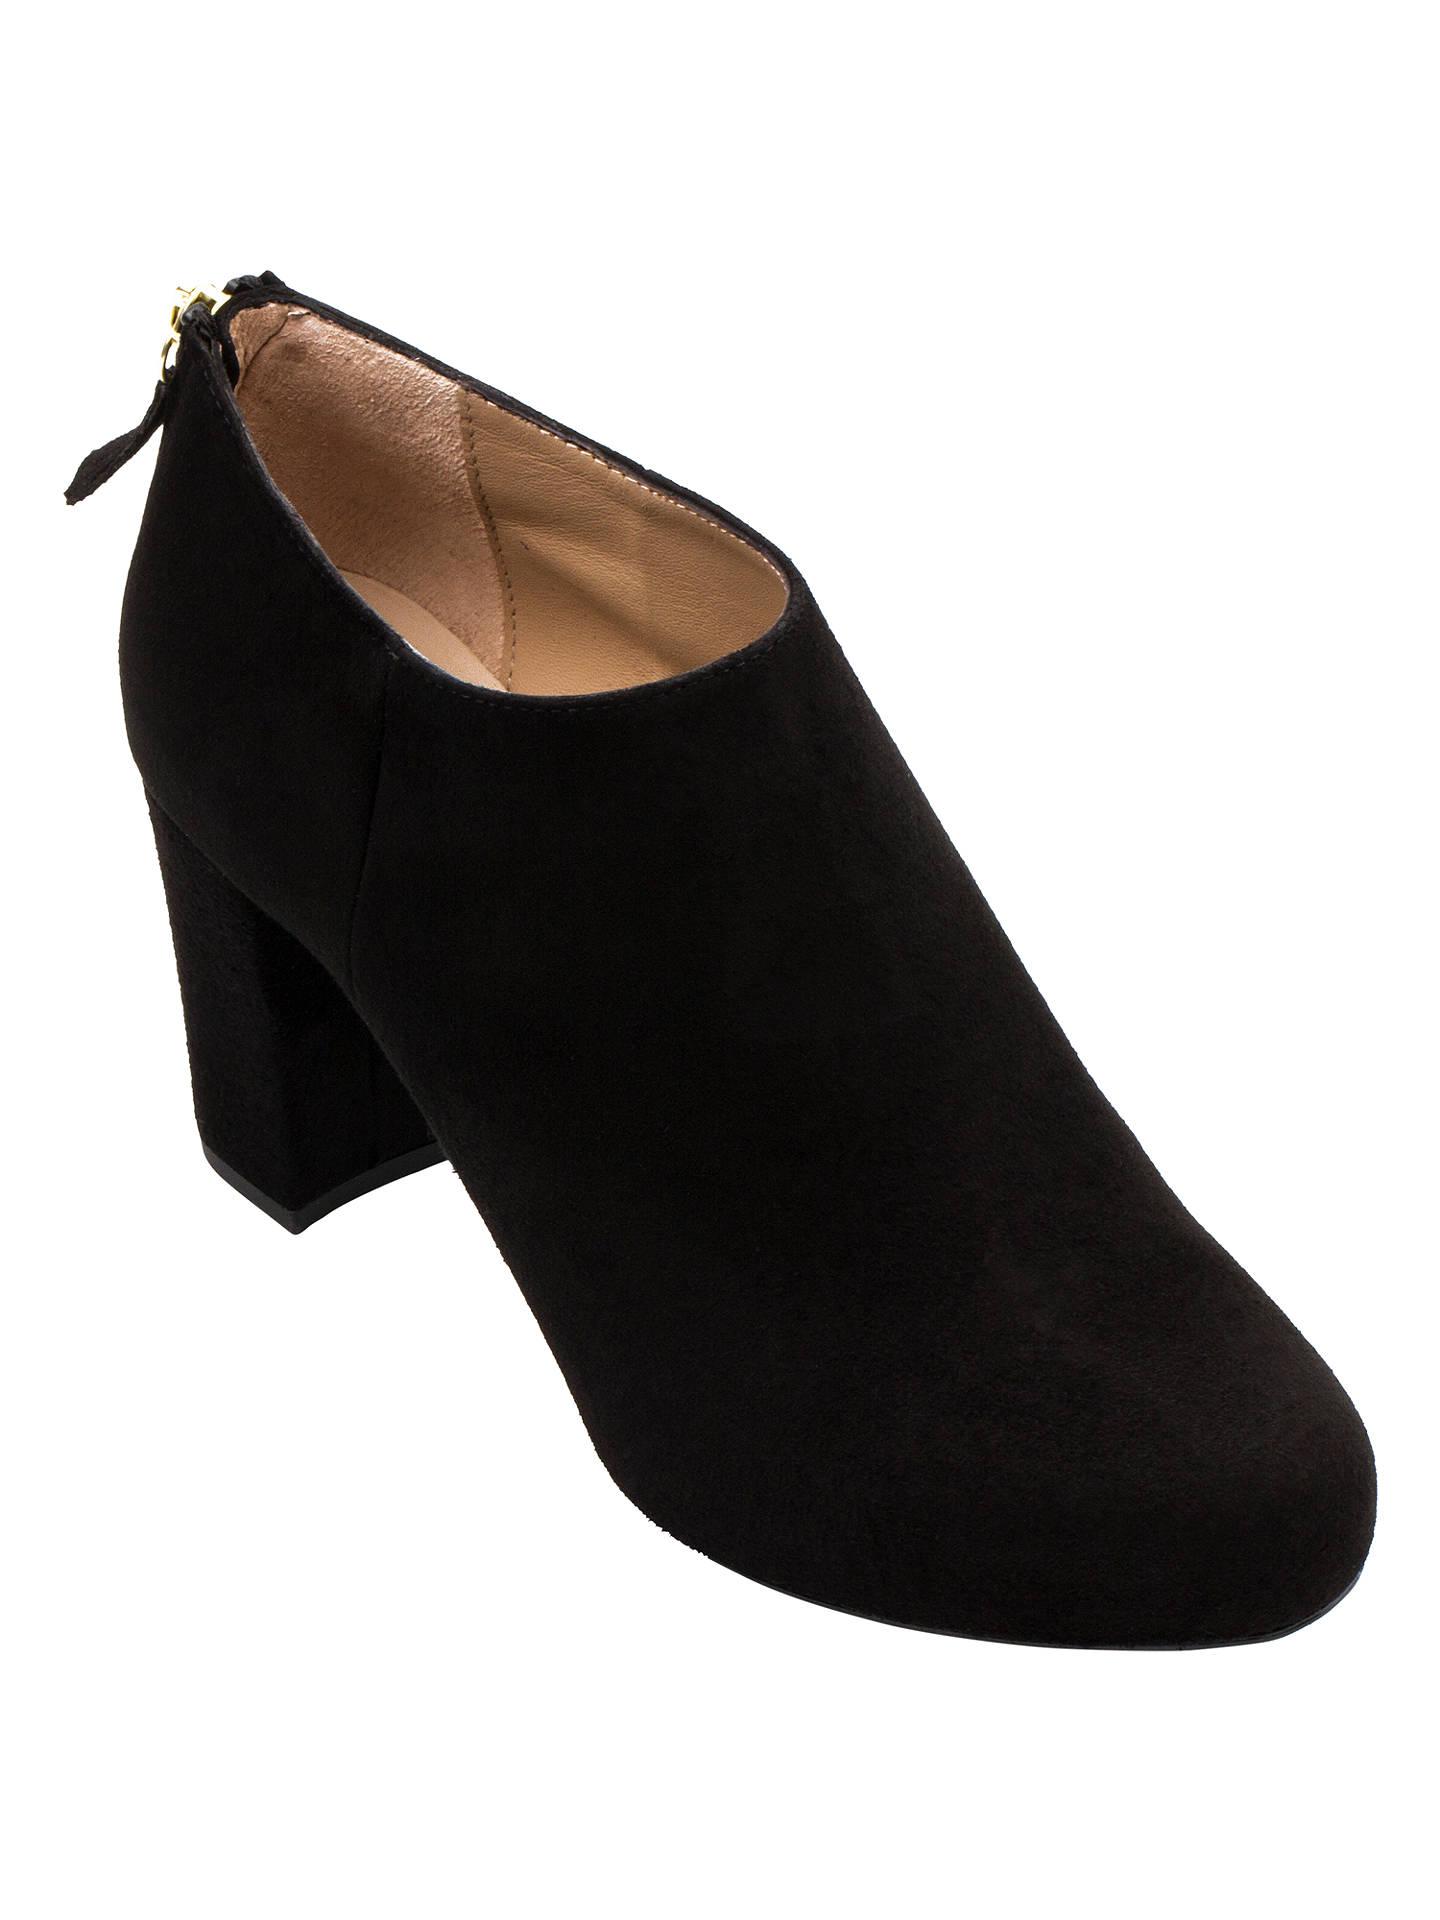 Unisa Nicolas Block Heeled Shoe Boots at John Lewis & Partners